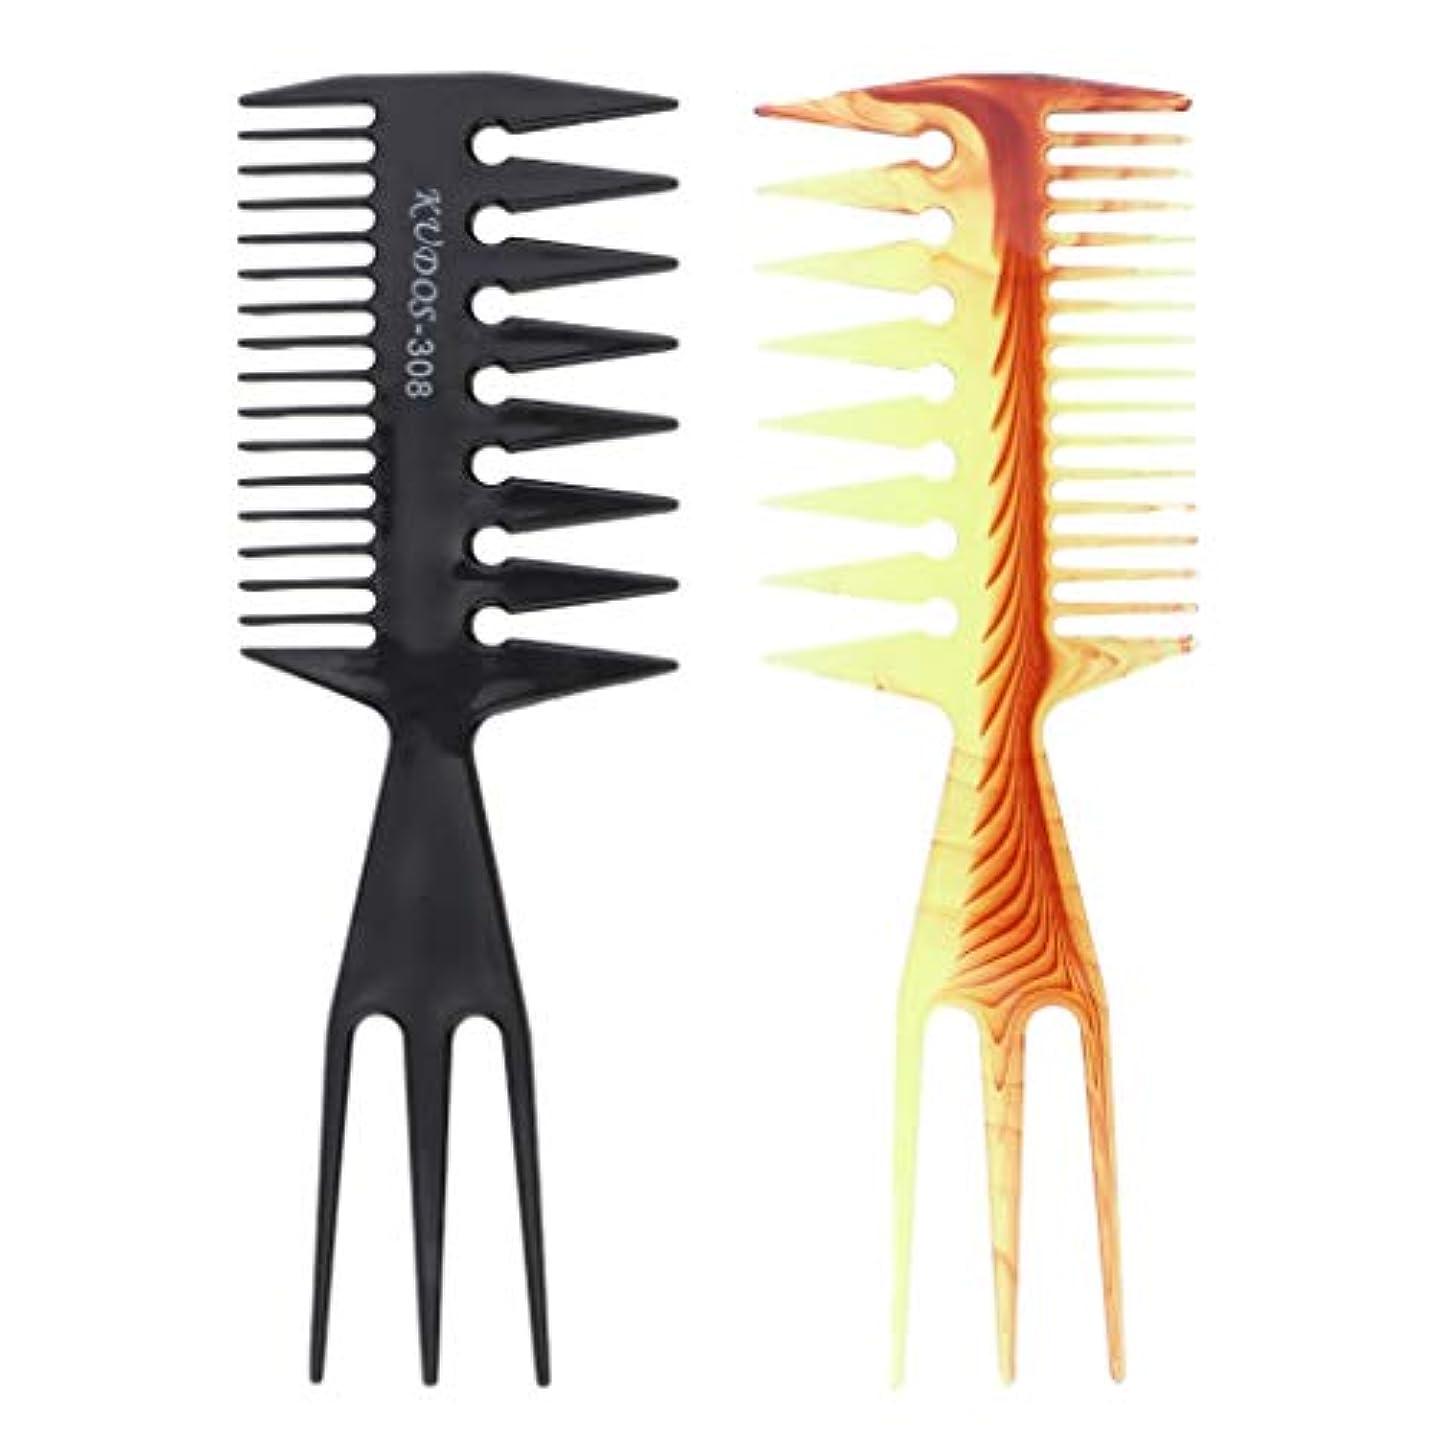 SM SunniMix へアカラーセット ヘアダイブラシ DIY髪染め用 サロン 美髪師用 ヘアカラーの用具 2個セット